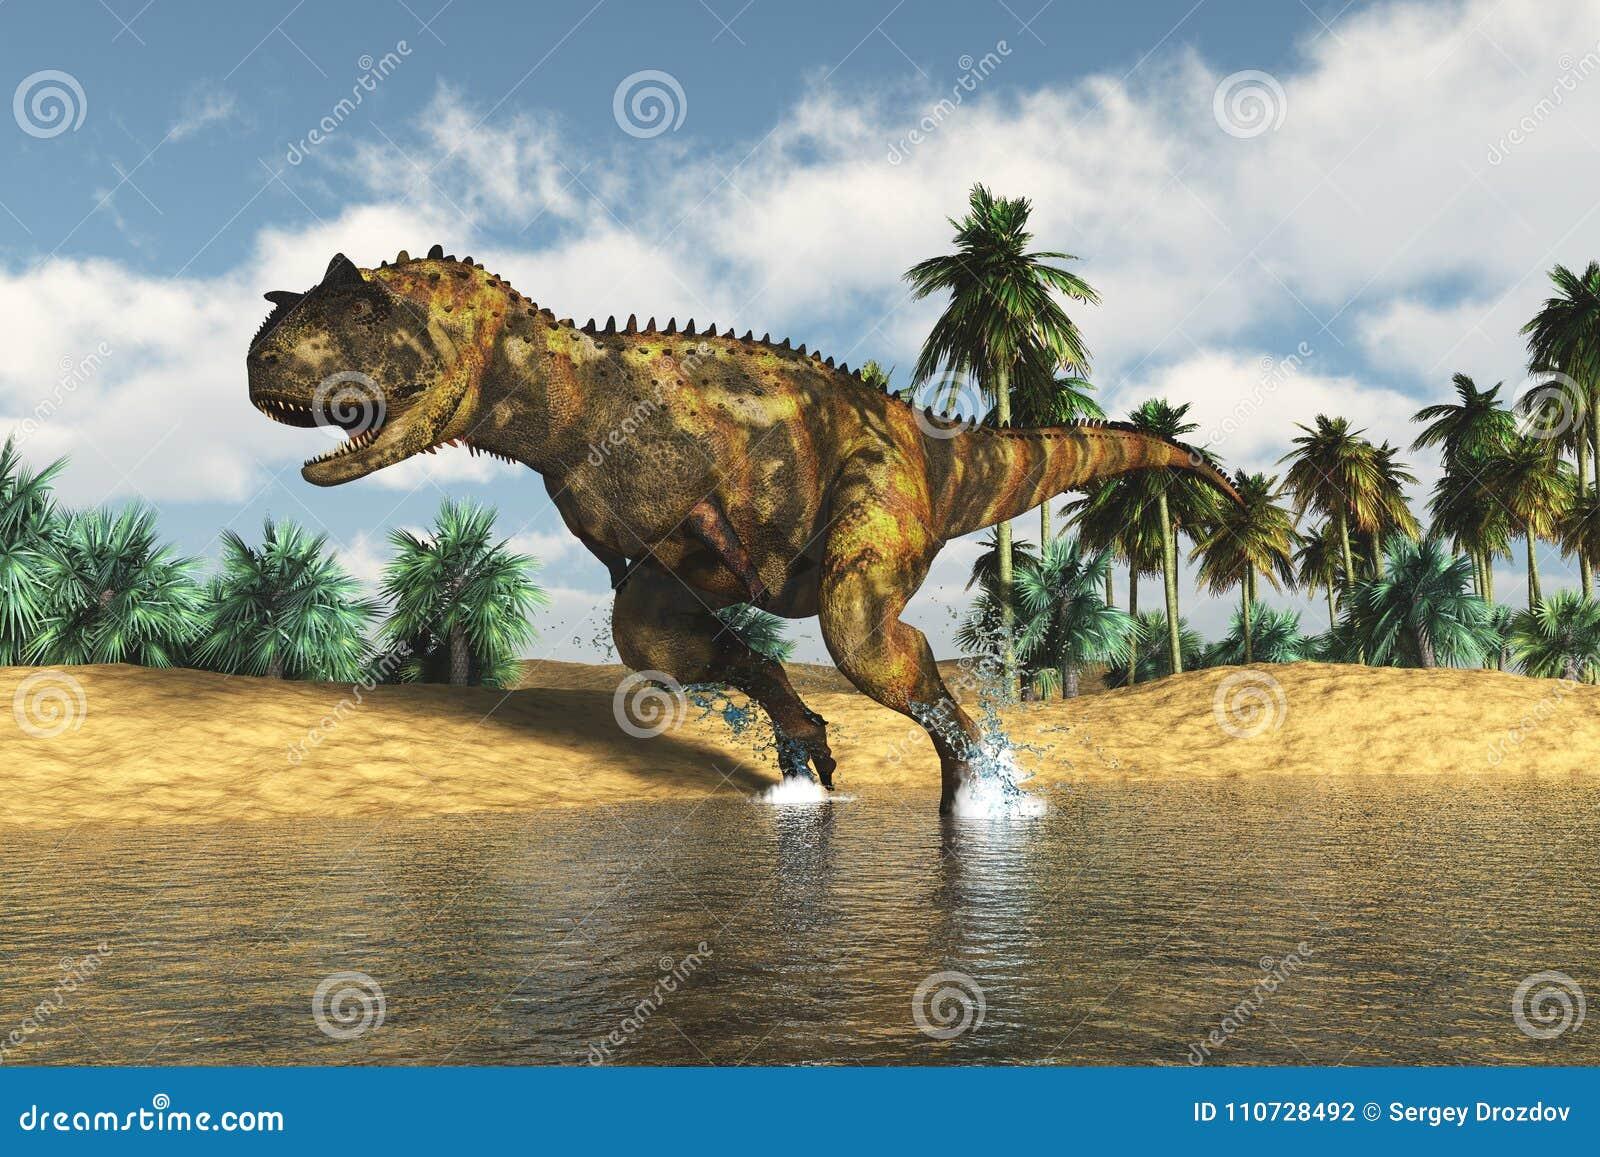 Roofzuchtige dinosaurus